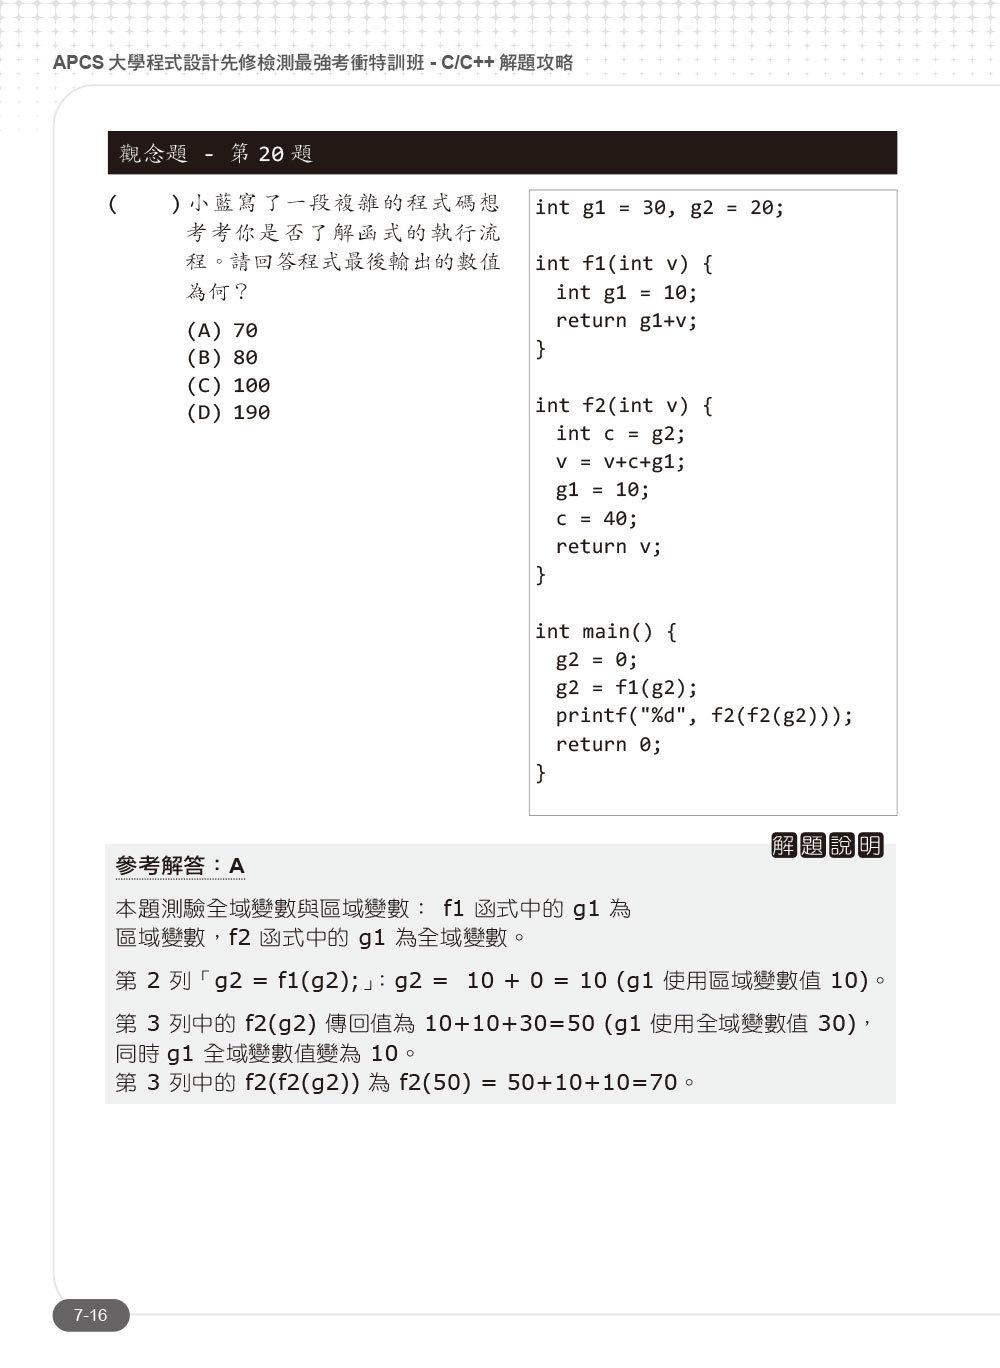 APCS 大學程式設計先修檢測最強考衝特訓班 -- C/C++ 解題攻略-preview-6